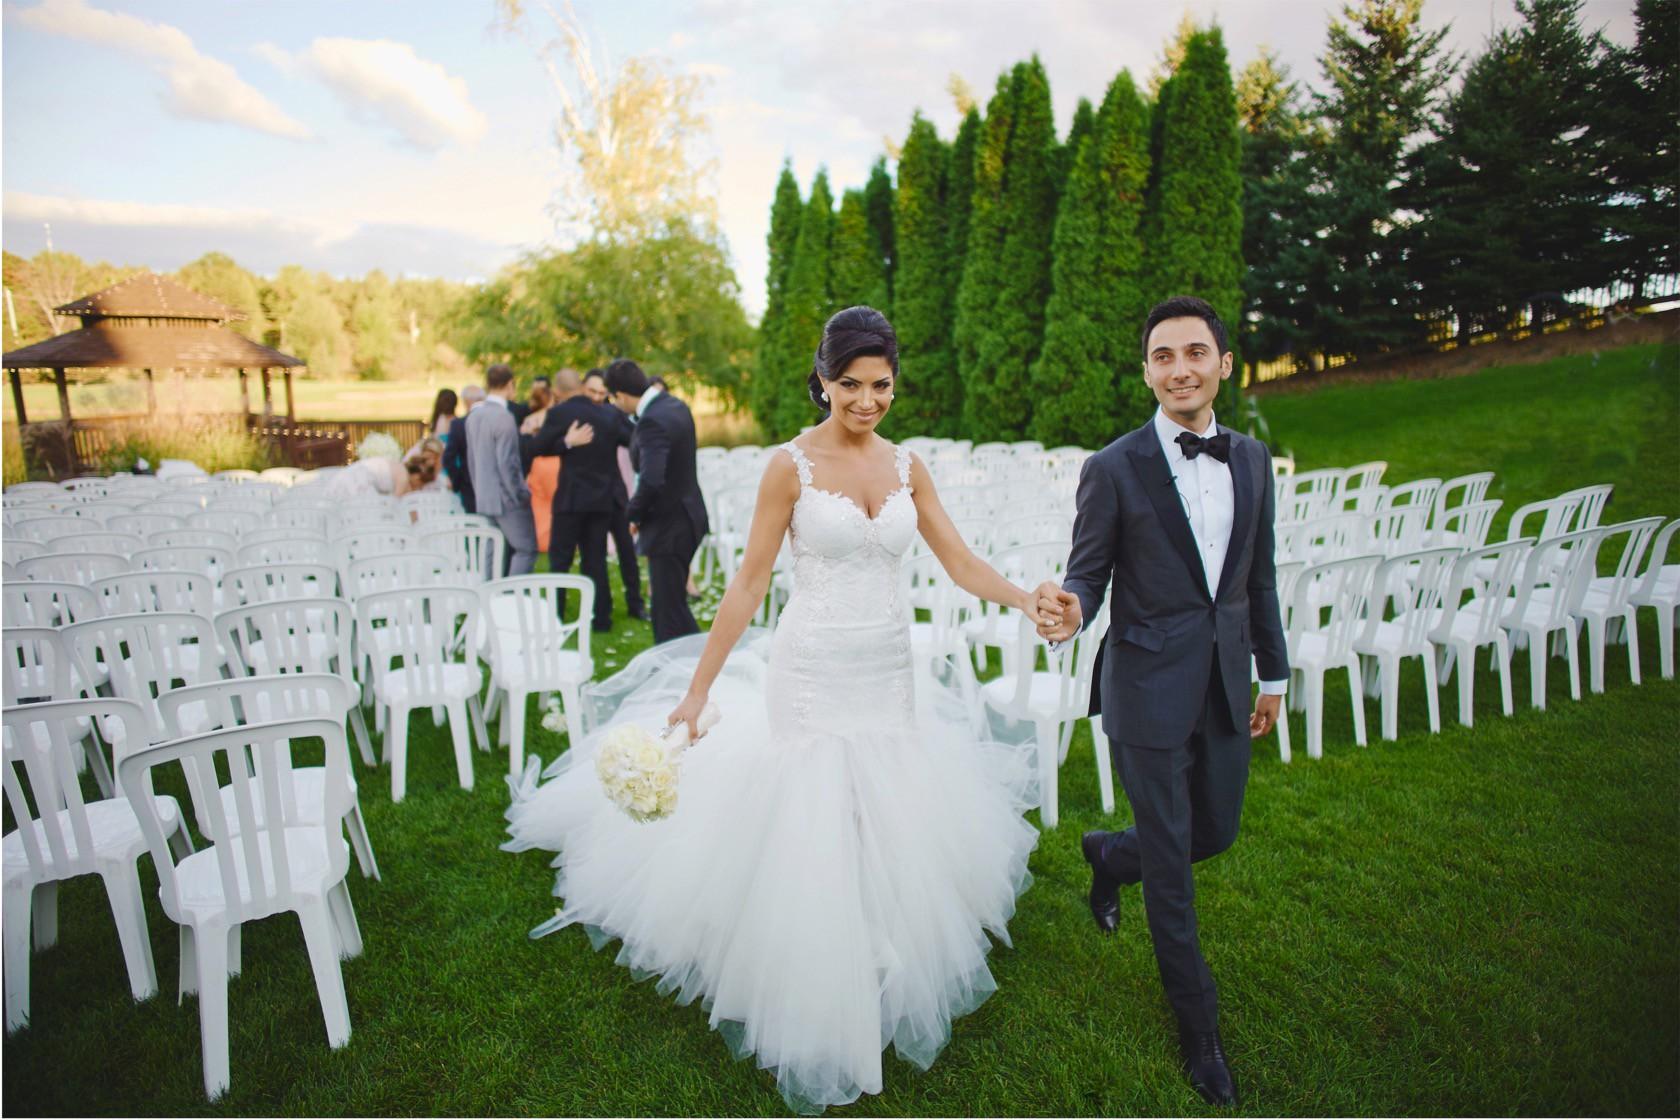 stephen sager photography 0019 fine art wedding photography